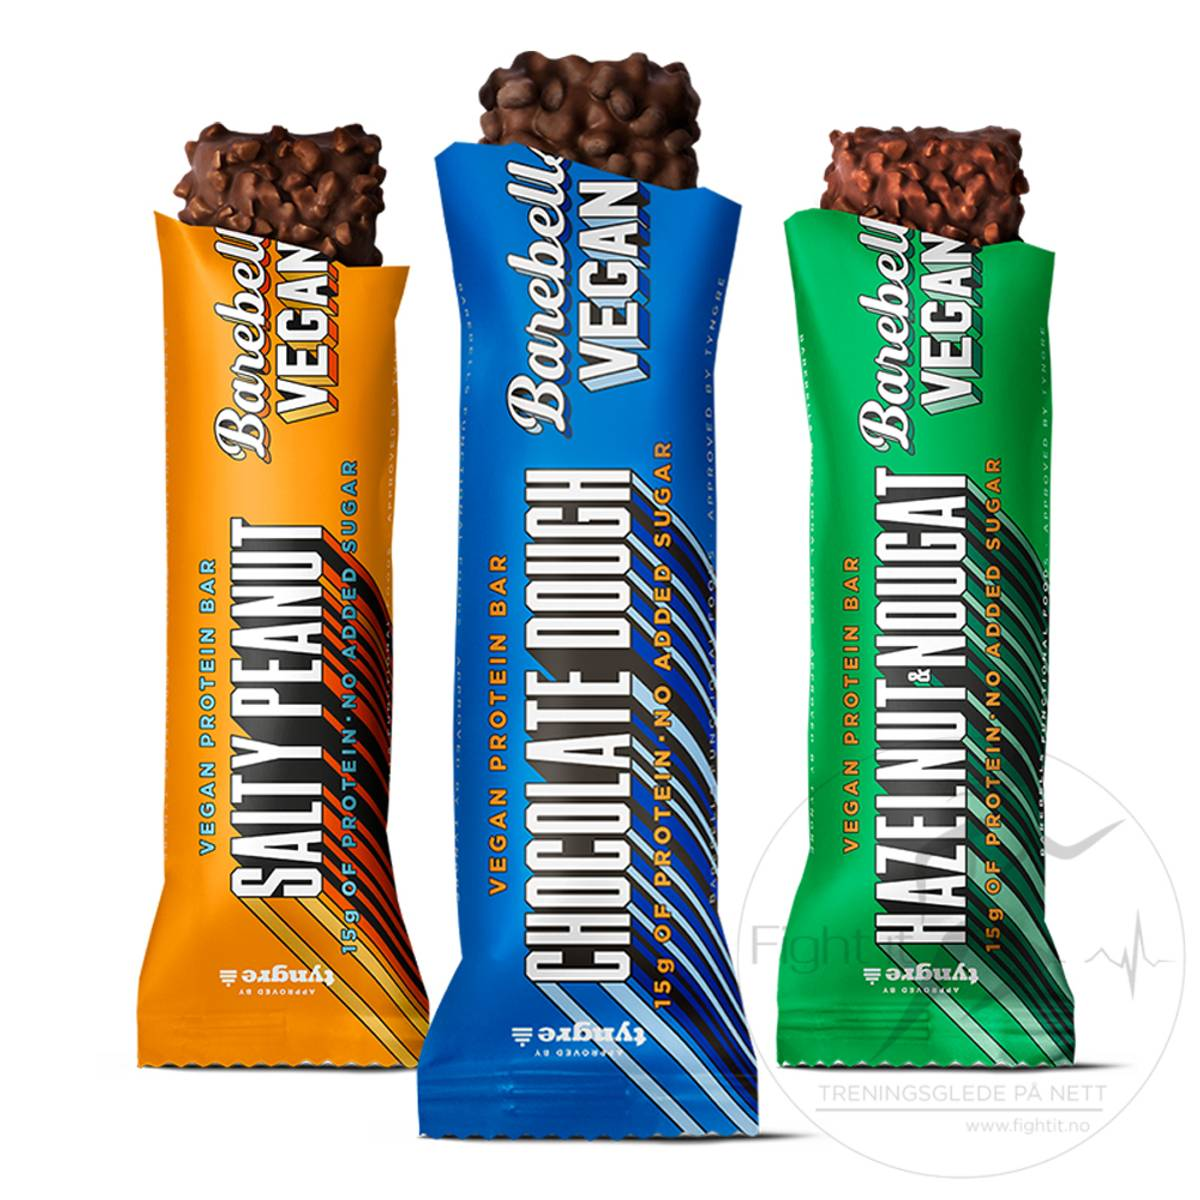 Barebells - Vegan Proteinbar - Chocolate Dough 55g